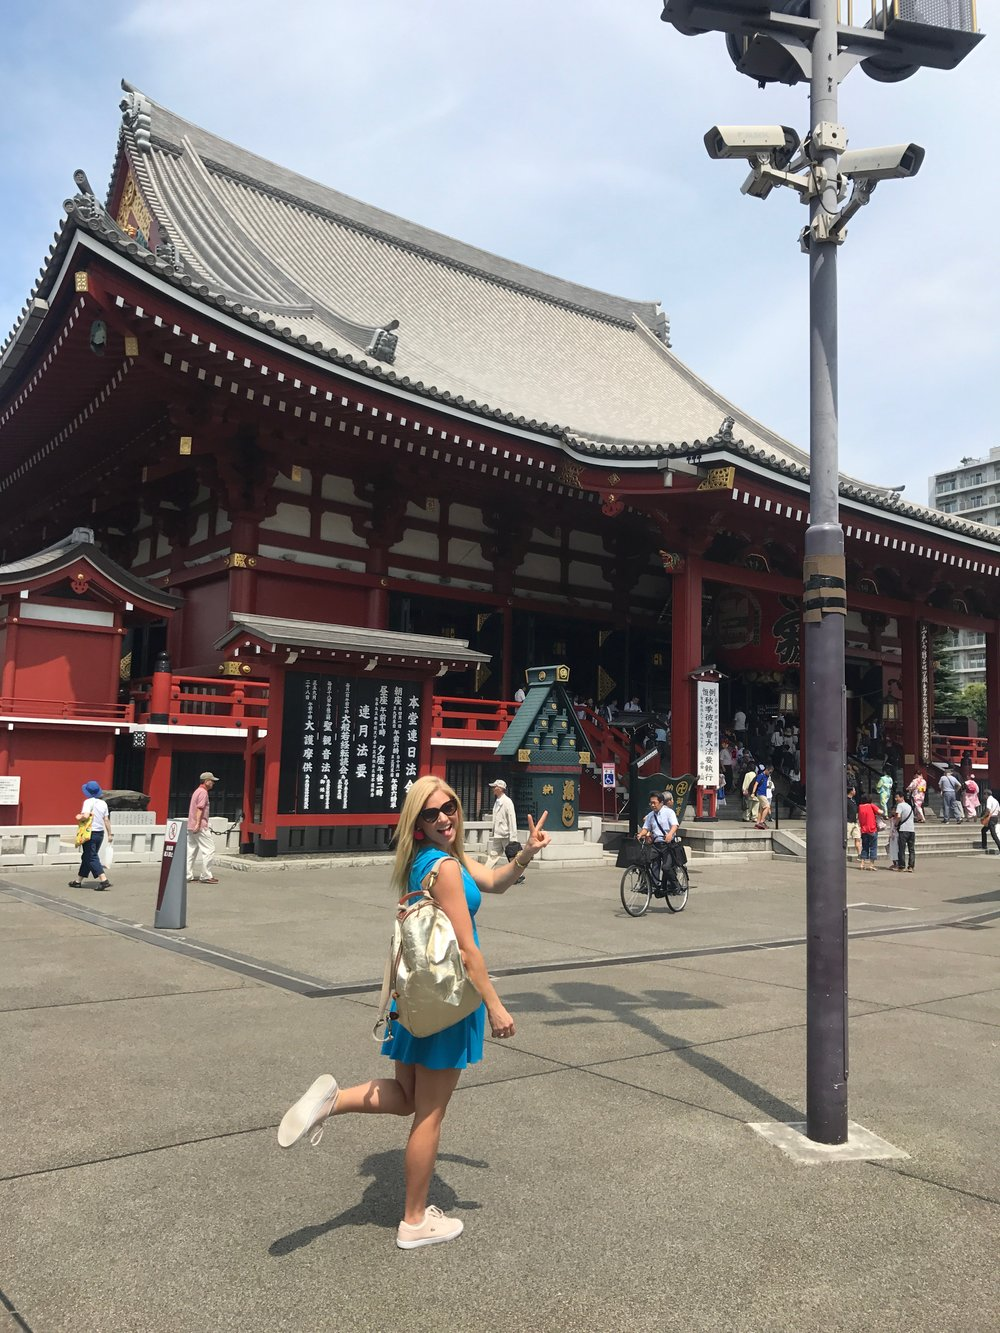 senso ji beijing seoul tokyo anna kooiman fitness travel lifestyle fashion asia adventure